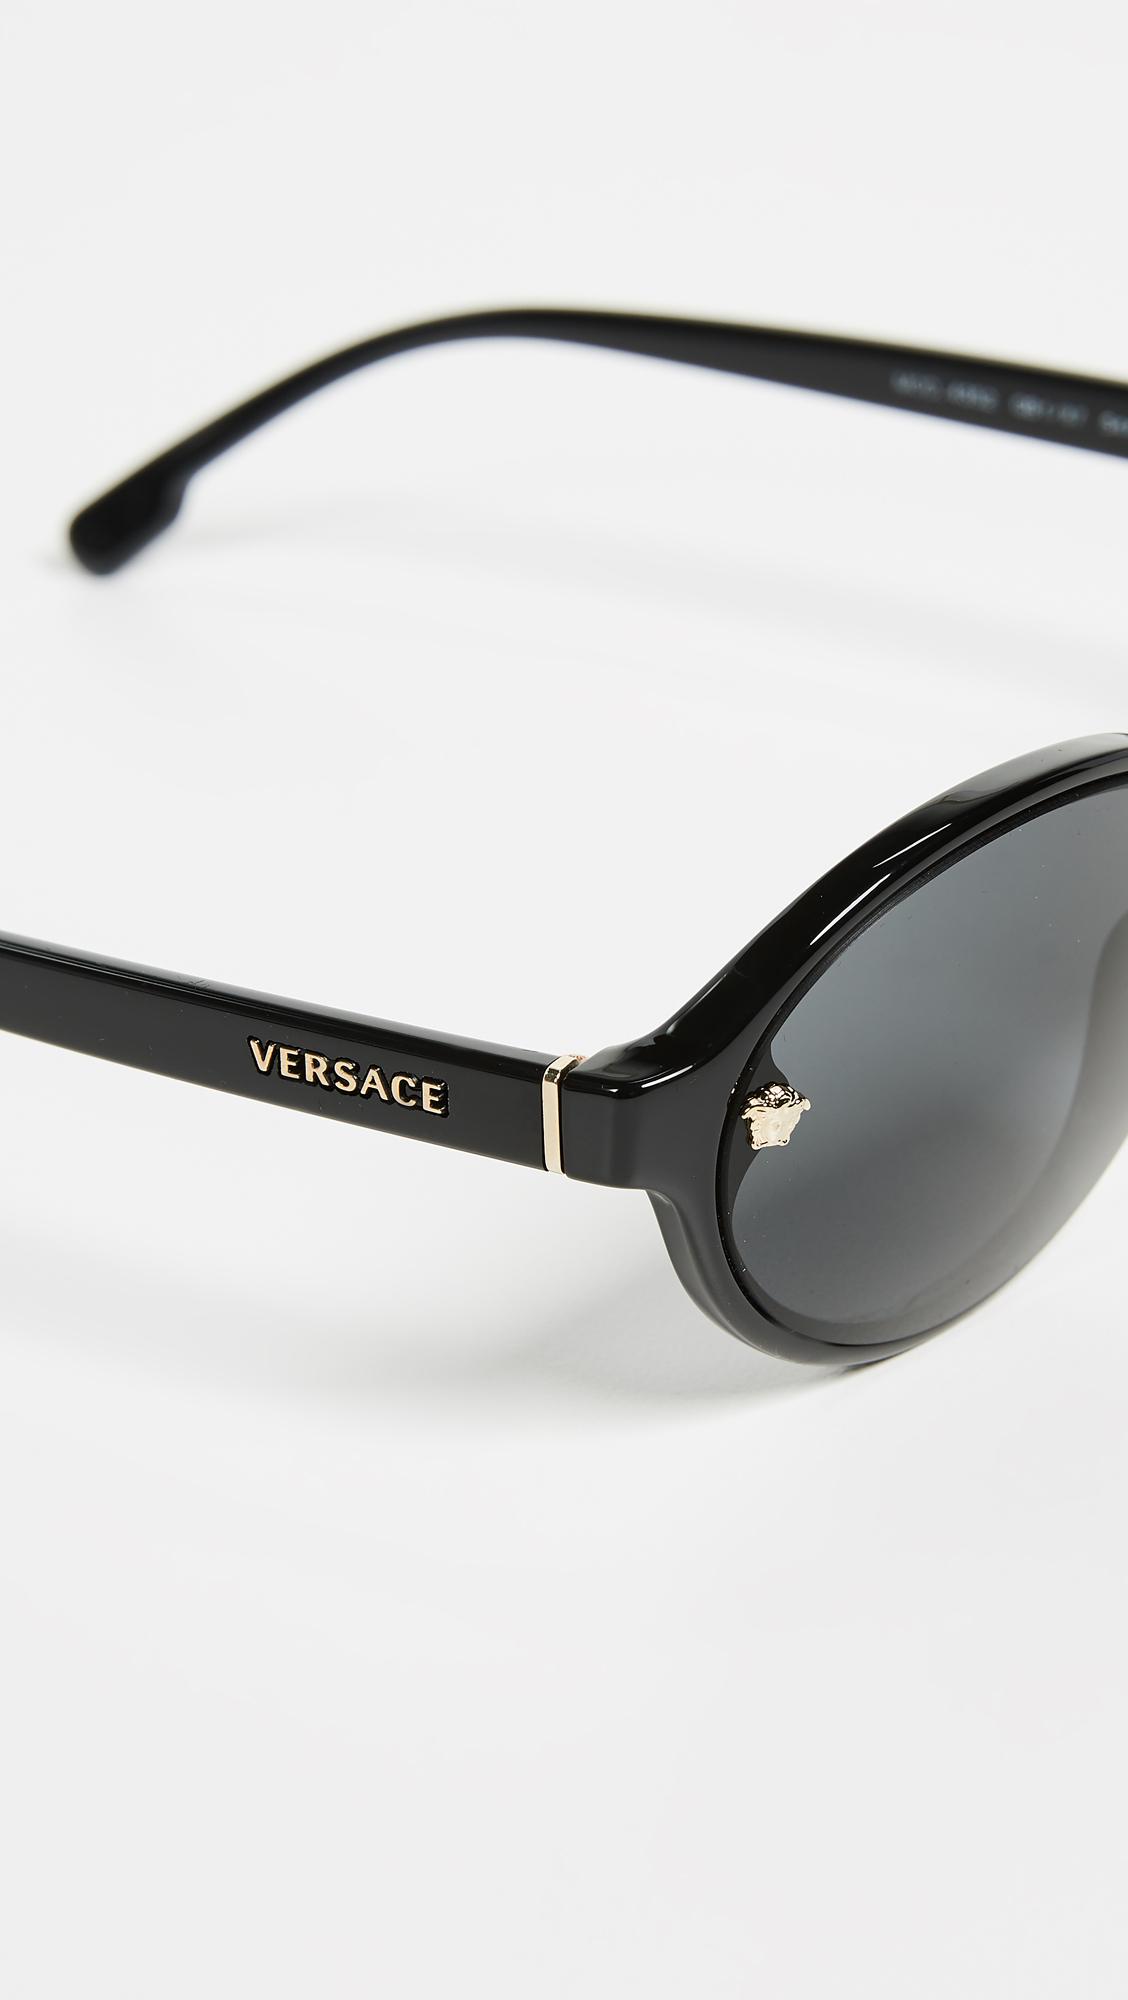 fc74175e453ea Versace VE4352 Skinny Oval Sunglasses